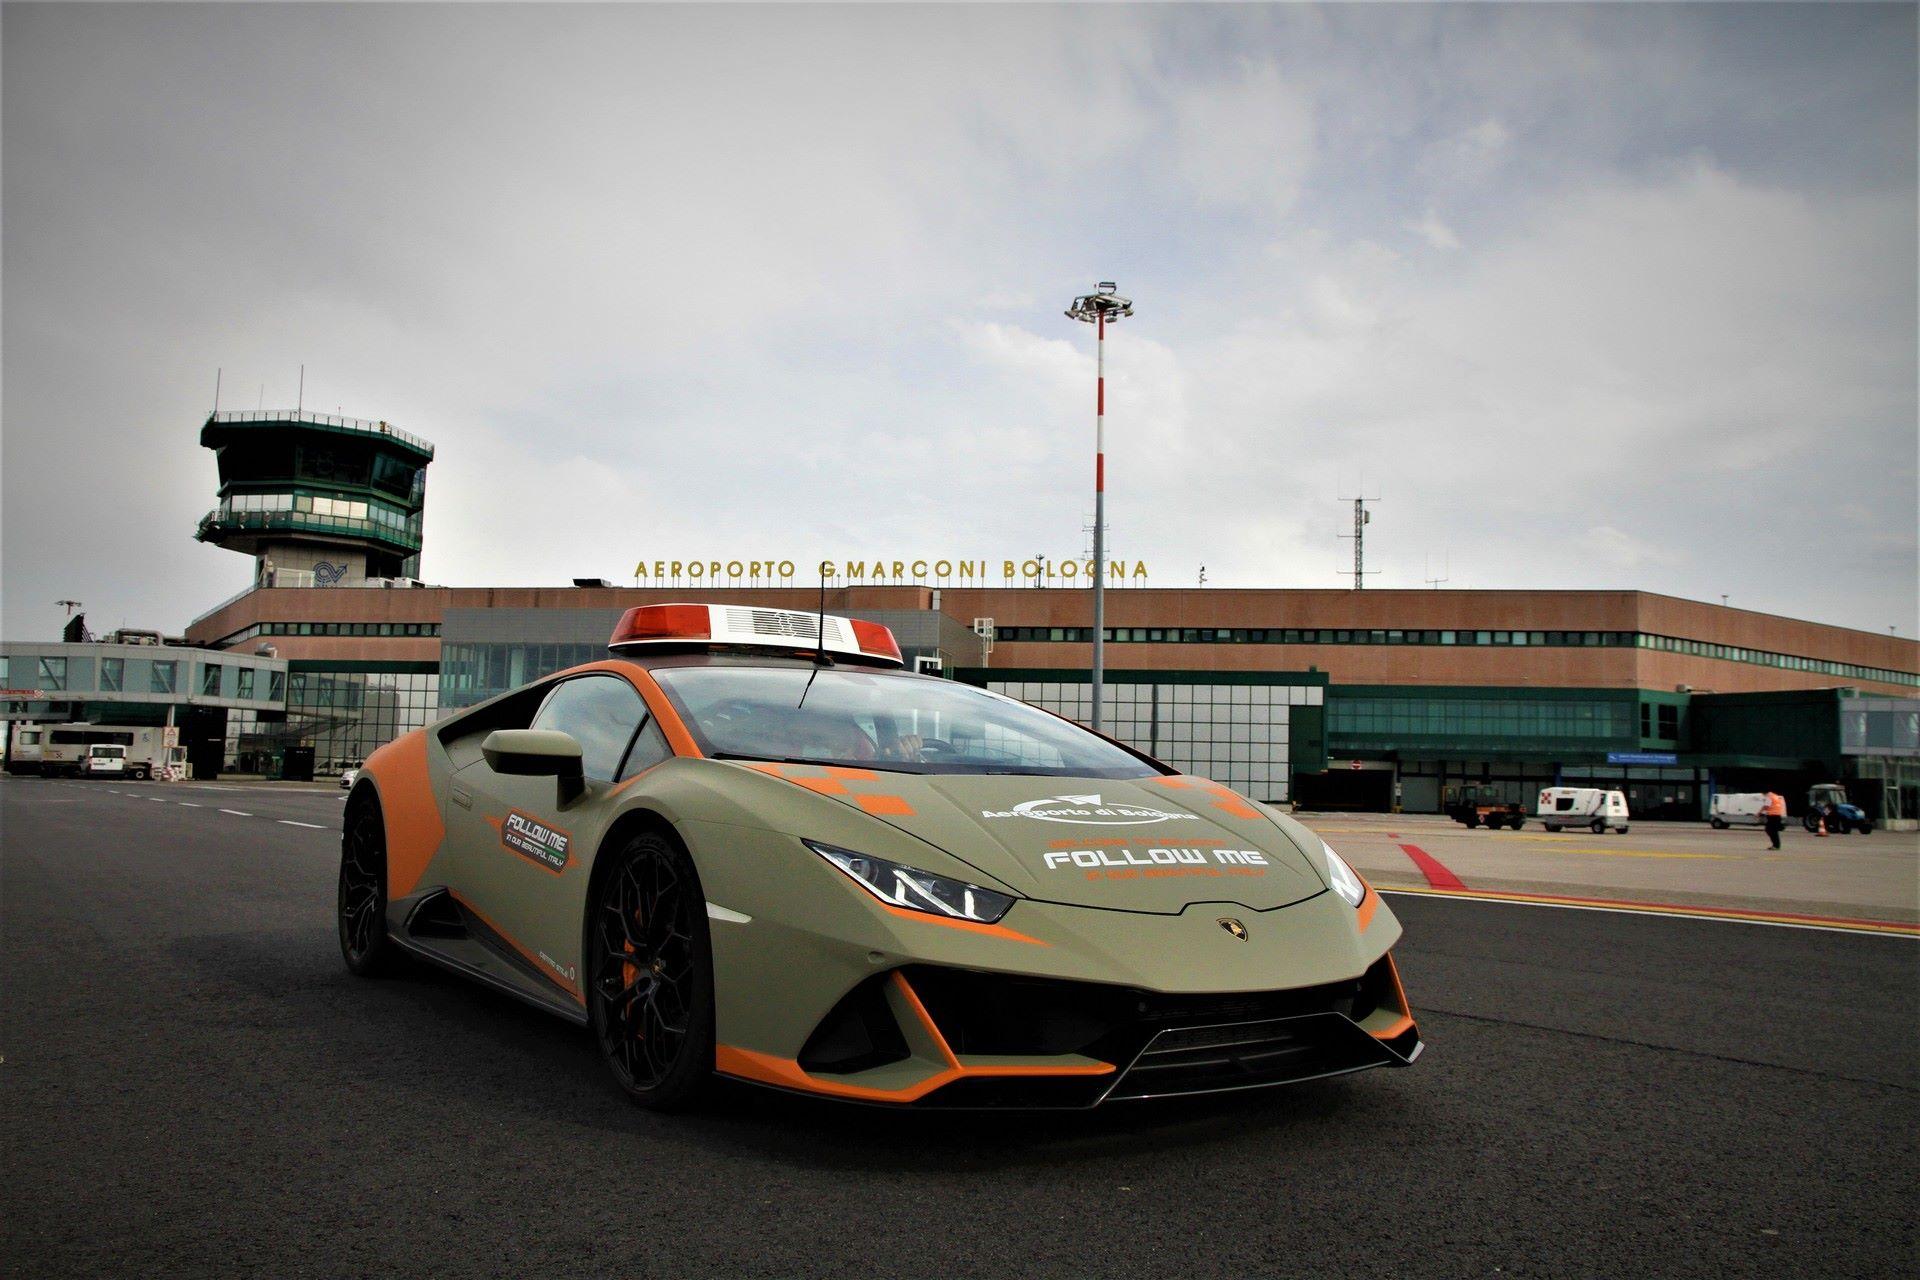 Lamborghini-Huracan-Evo-Follow-Me-bologna-airport-2021-10